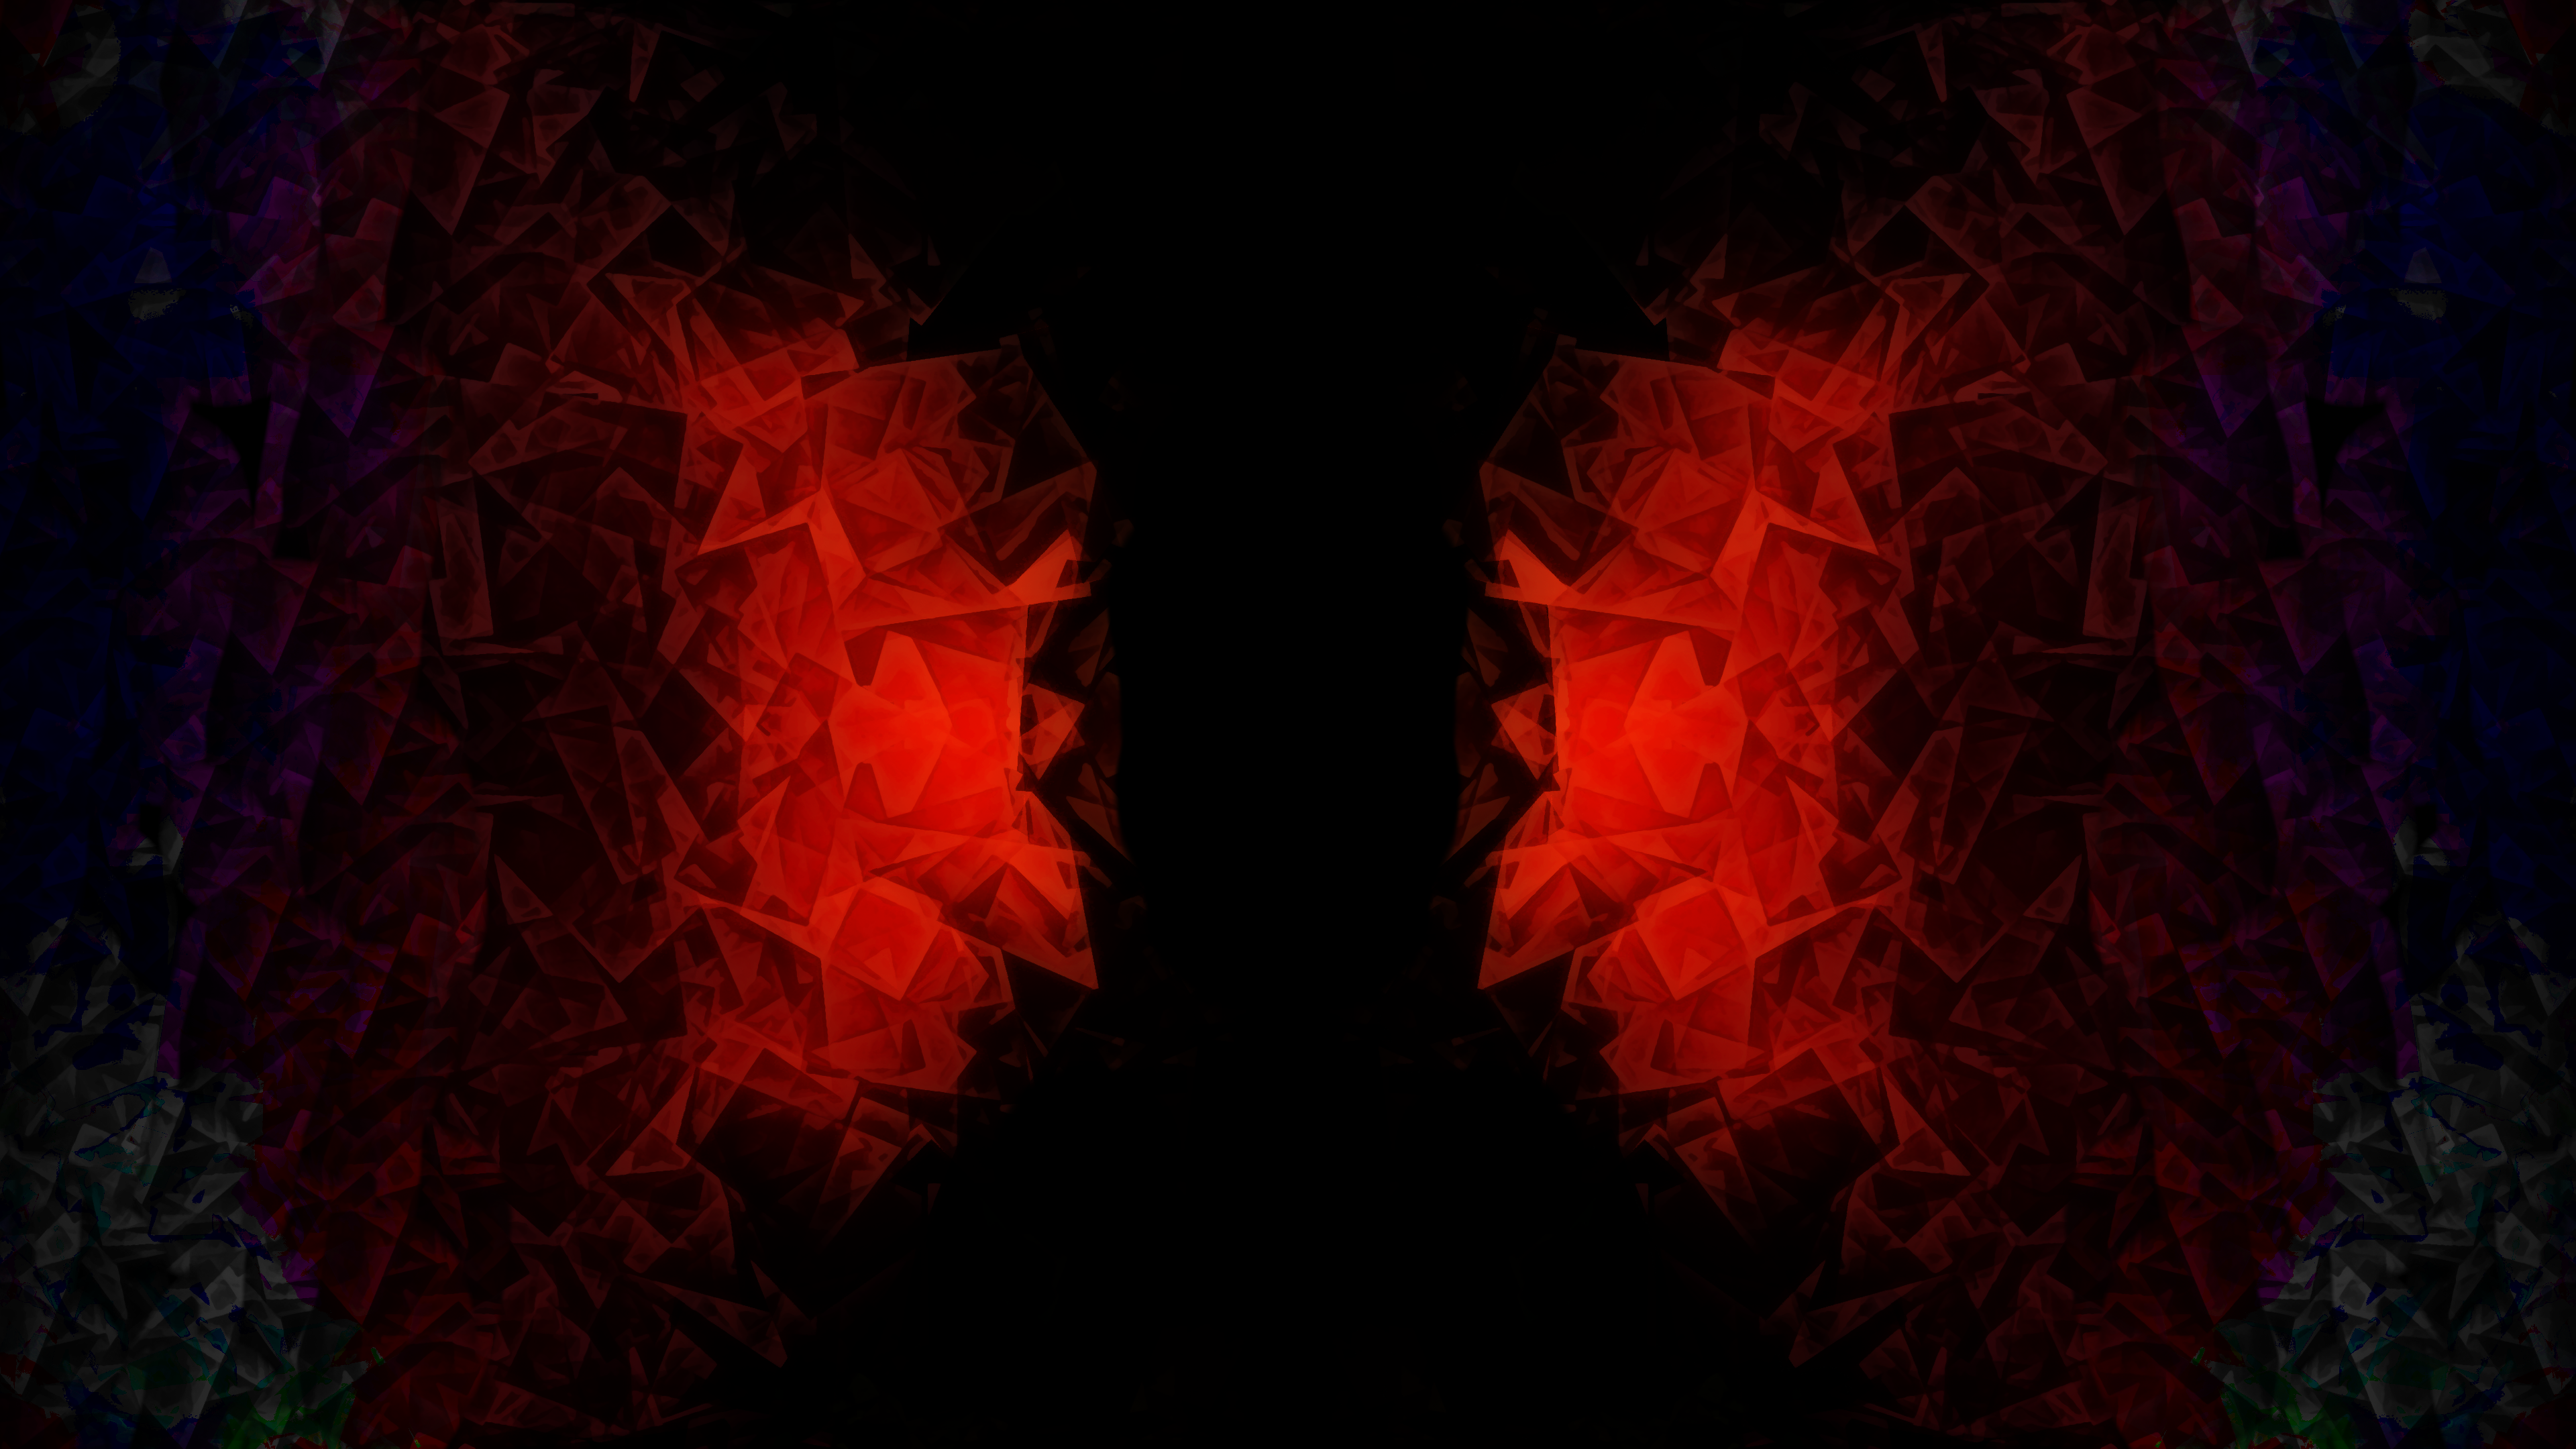 D D Crystal 4k Ultra Hd Wallpaper Background Image 3840x2160